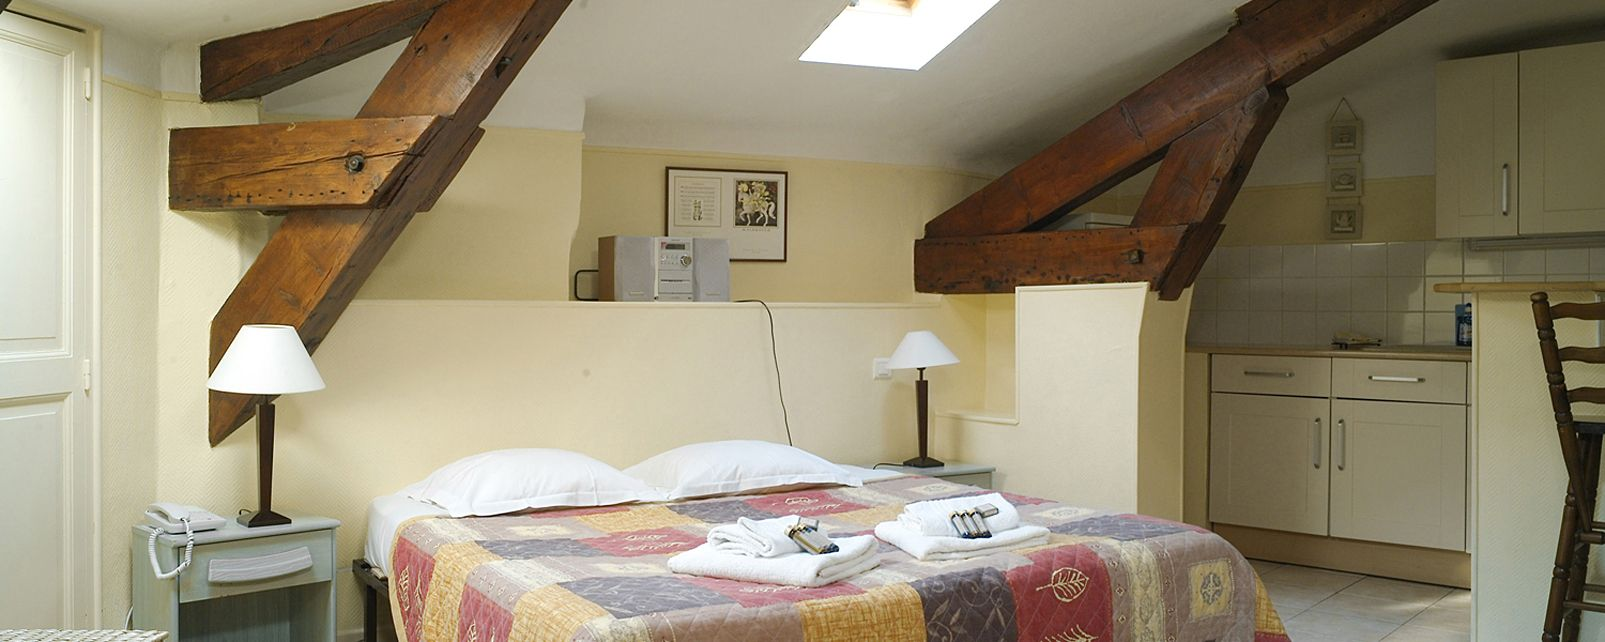 Hotel Villa d'Estelle